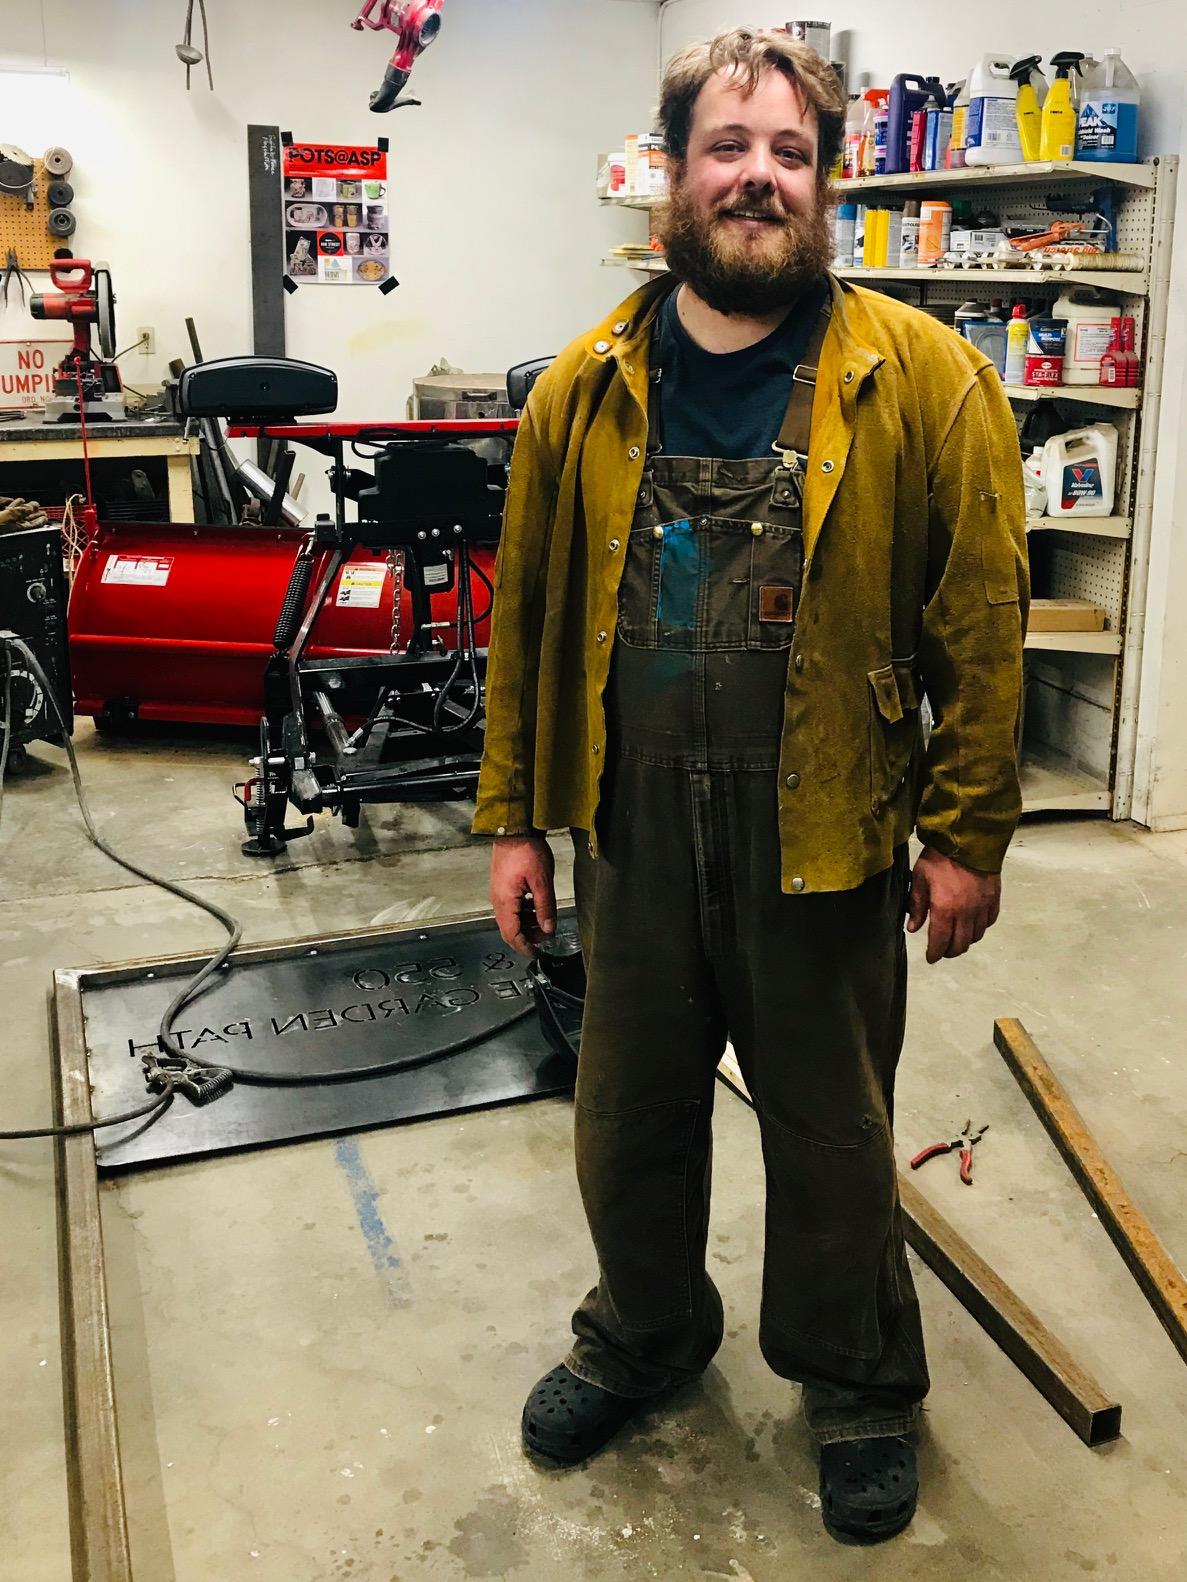 Ben Craigie in his studio working on a metal sign.